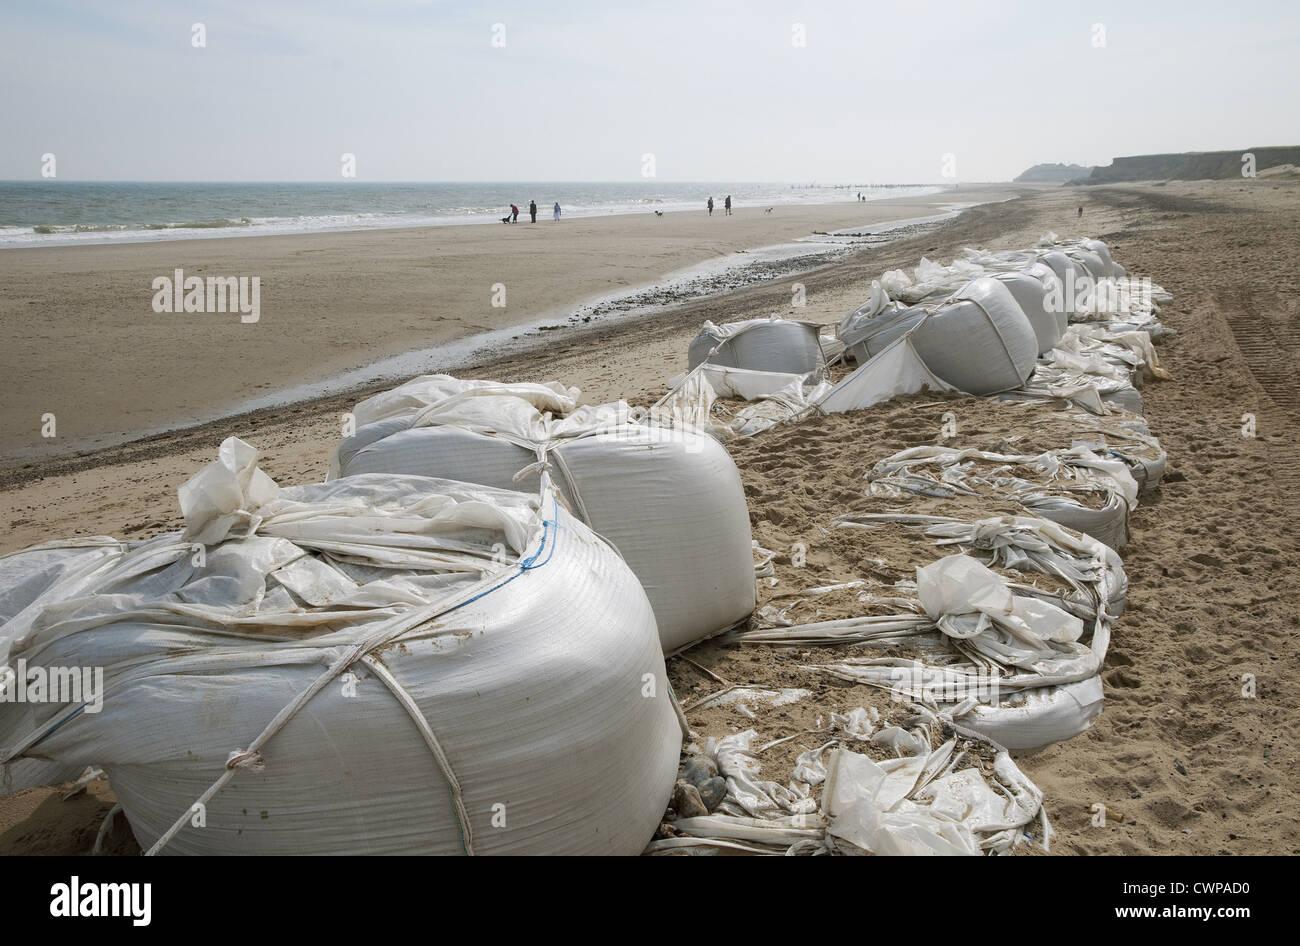 Failed geotextile tube (geotube) sea defences on beach, Happisburgh, Norfolk, England, august - Stock Image